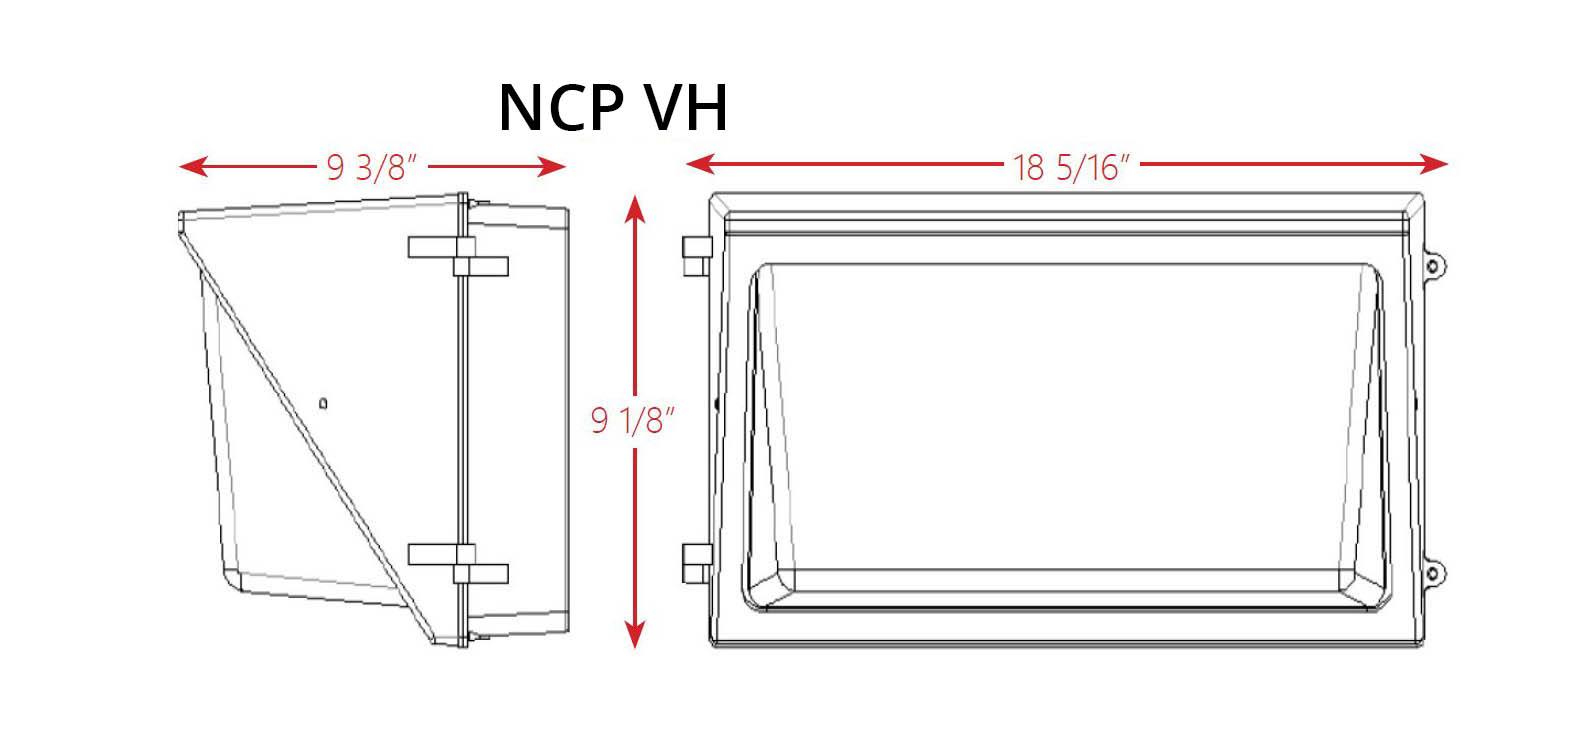 https://unamilighting.com/wp-content/uploads/2018/04/NCP-VH-schematic.jpg